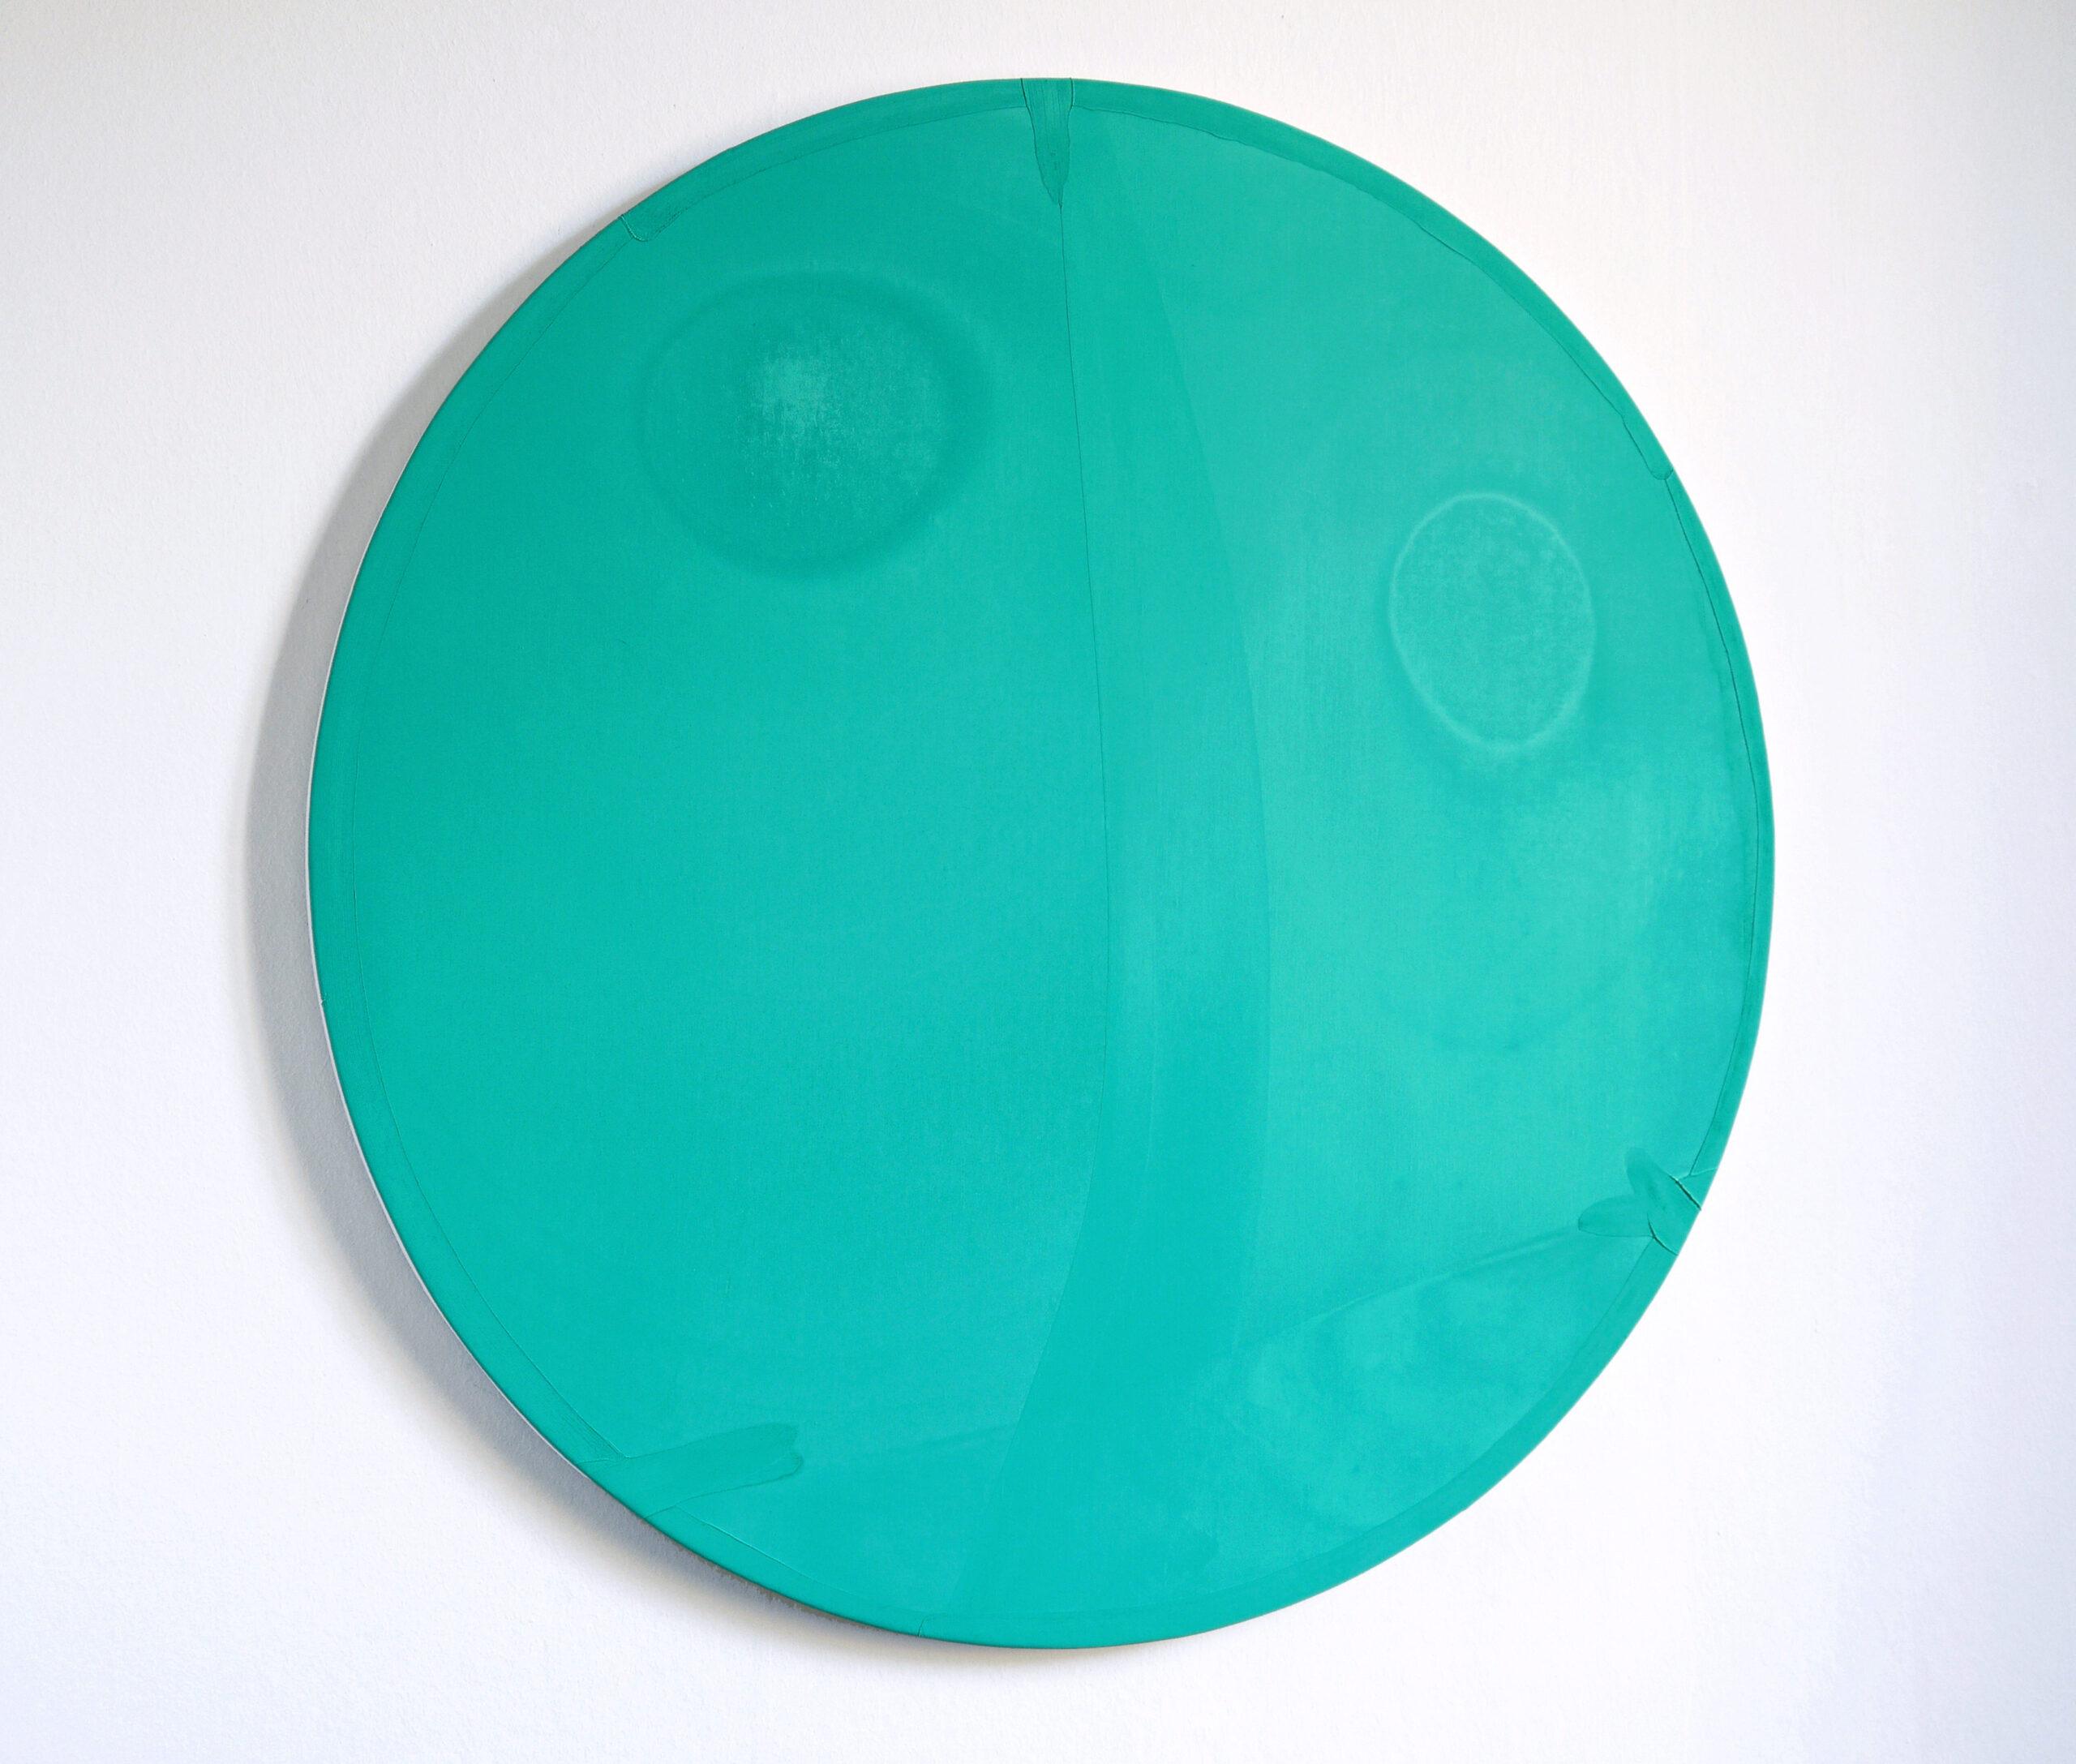 Antonio Catelani - flying kisses (turquoise), 2020 oil on canvas cm 80 Ø